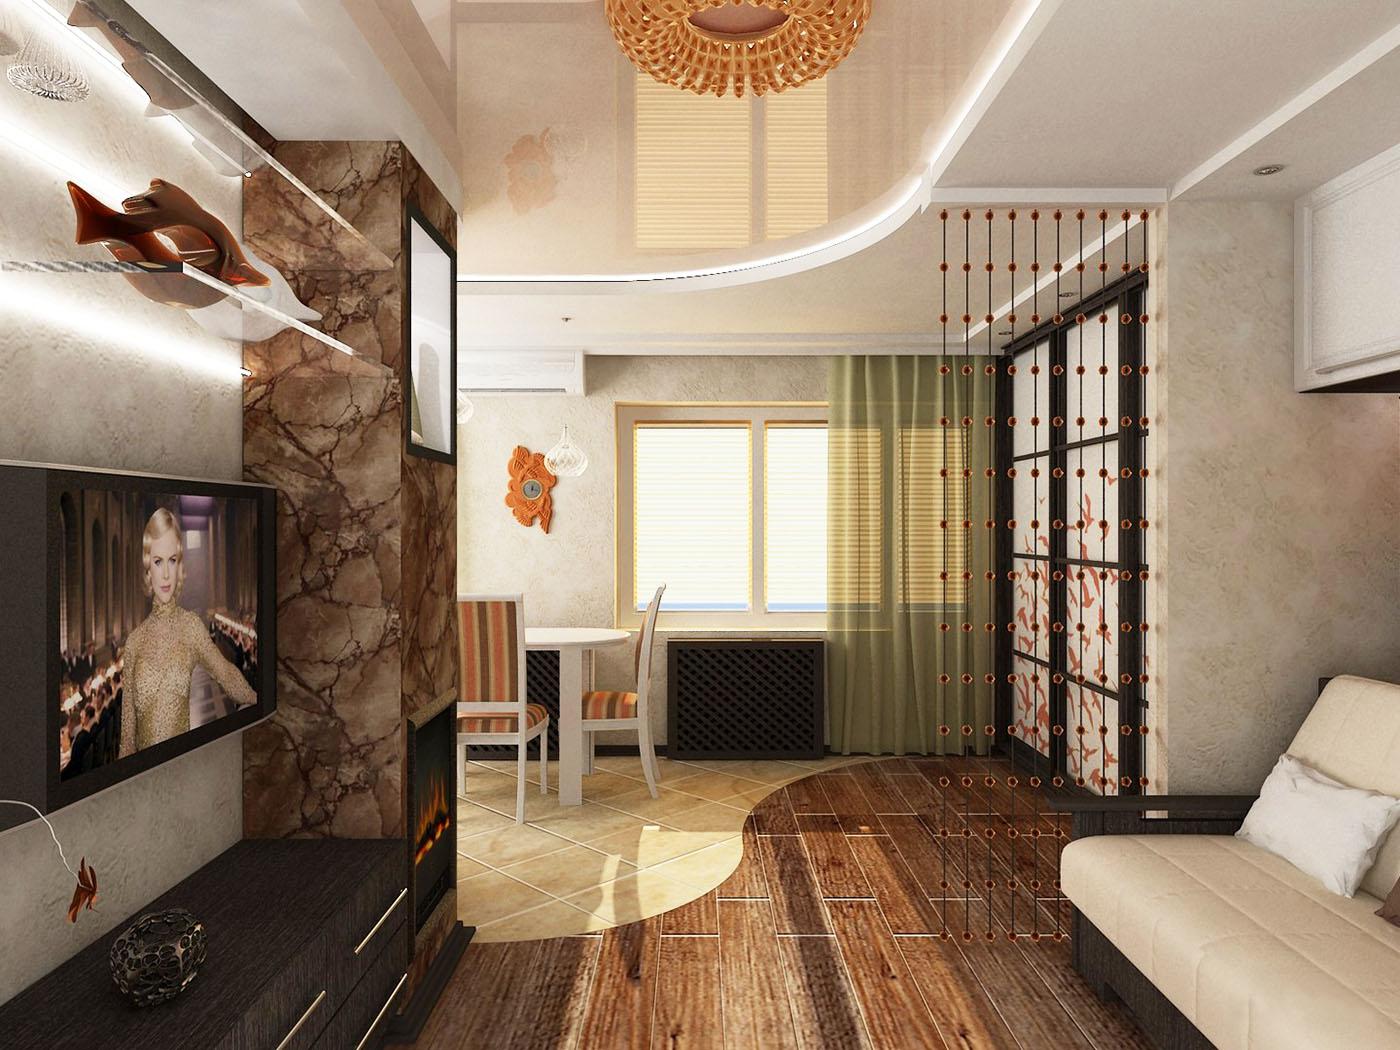 Хрущевка 2 комнатная дизайн гостиная